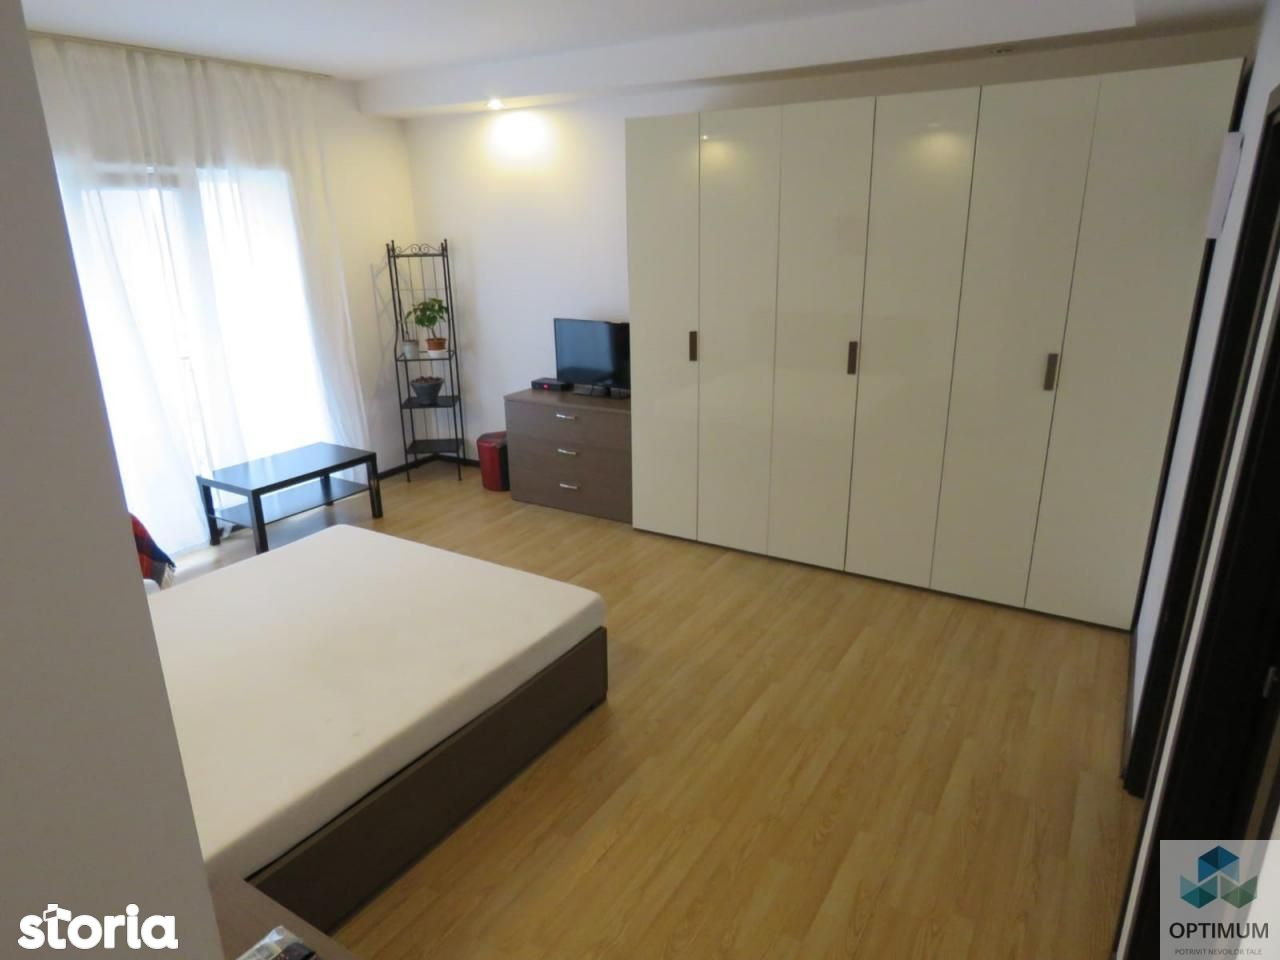 Apartament de inchiriat, București (judet), Cosmopolis - Foto 1